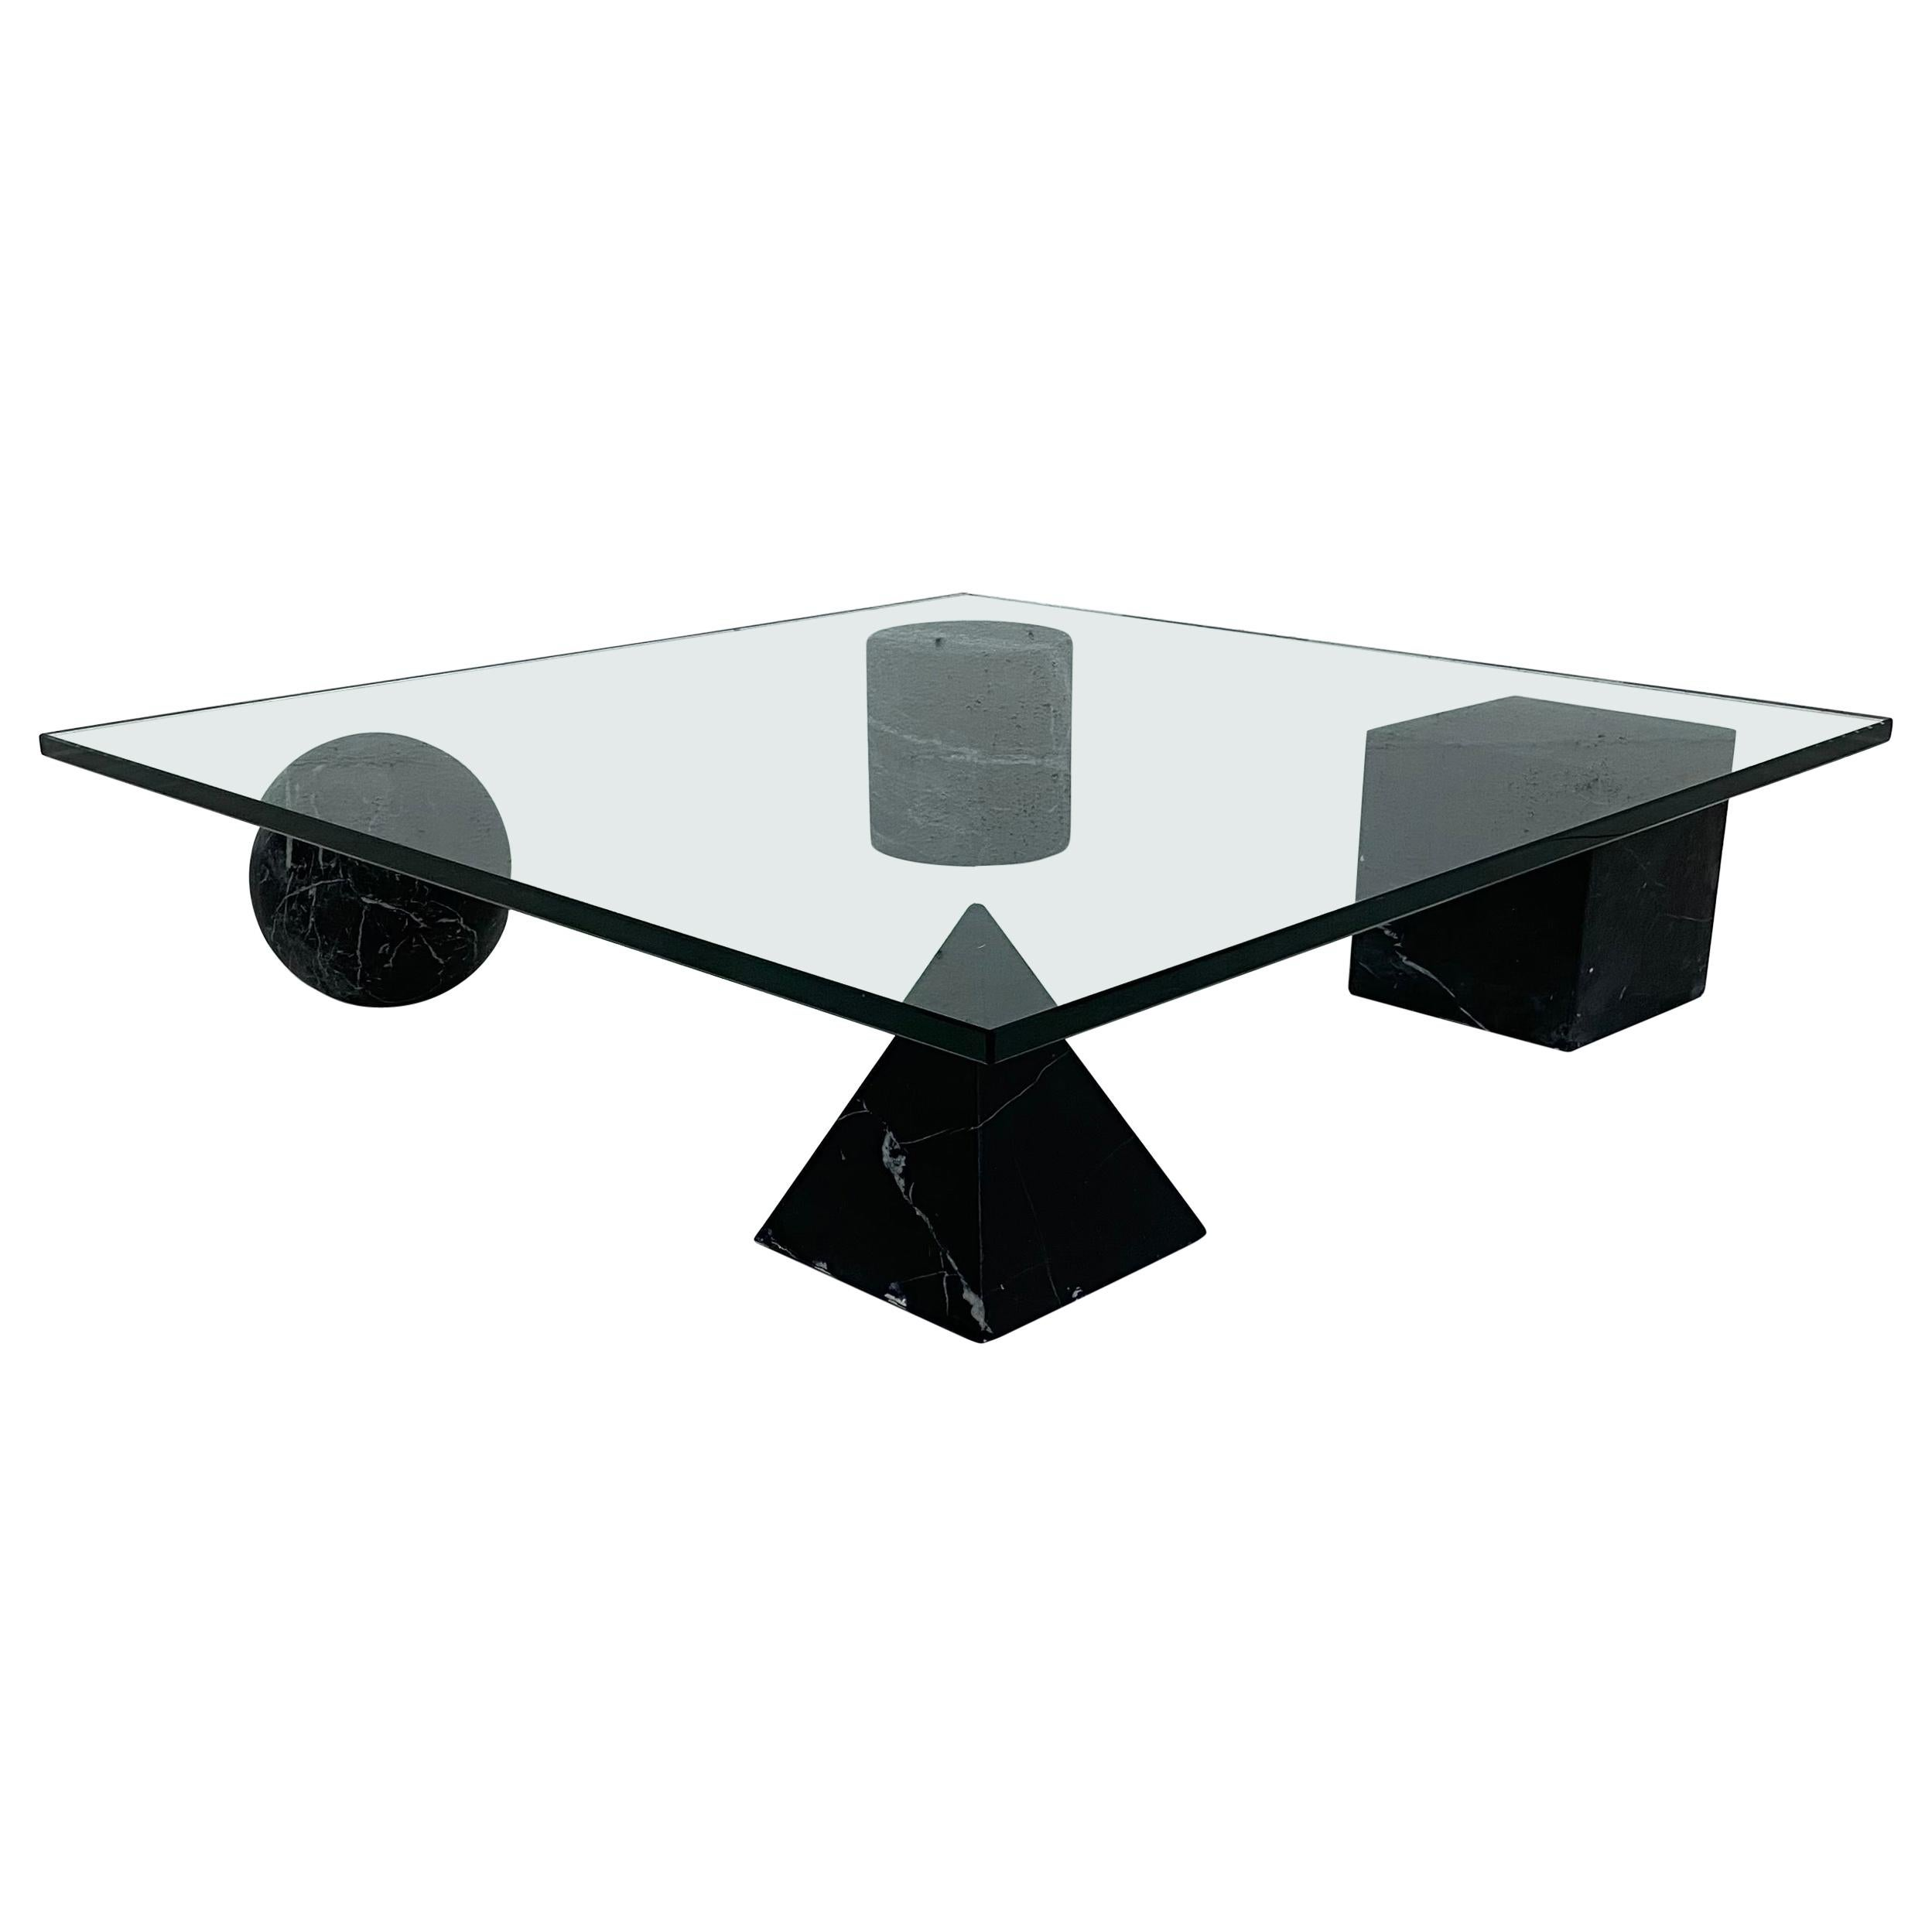 Lella and Massimo Vignelli Metafora Coffee Table for Casigliani, 1979